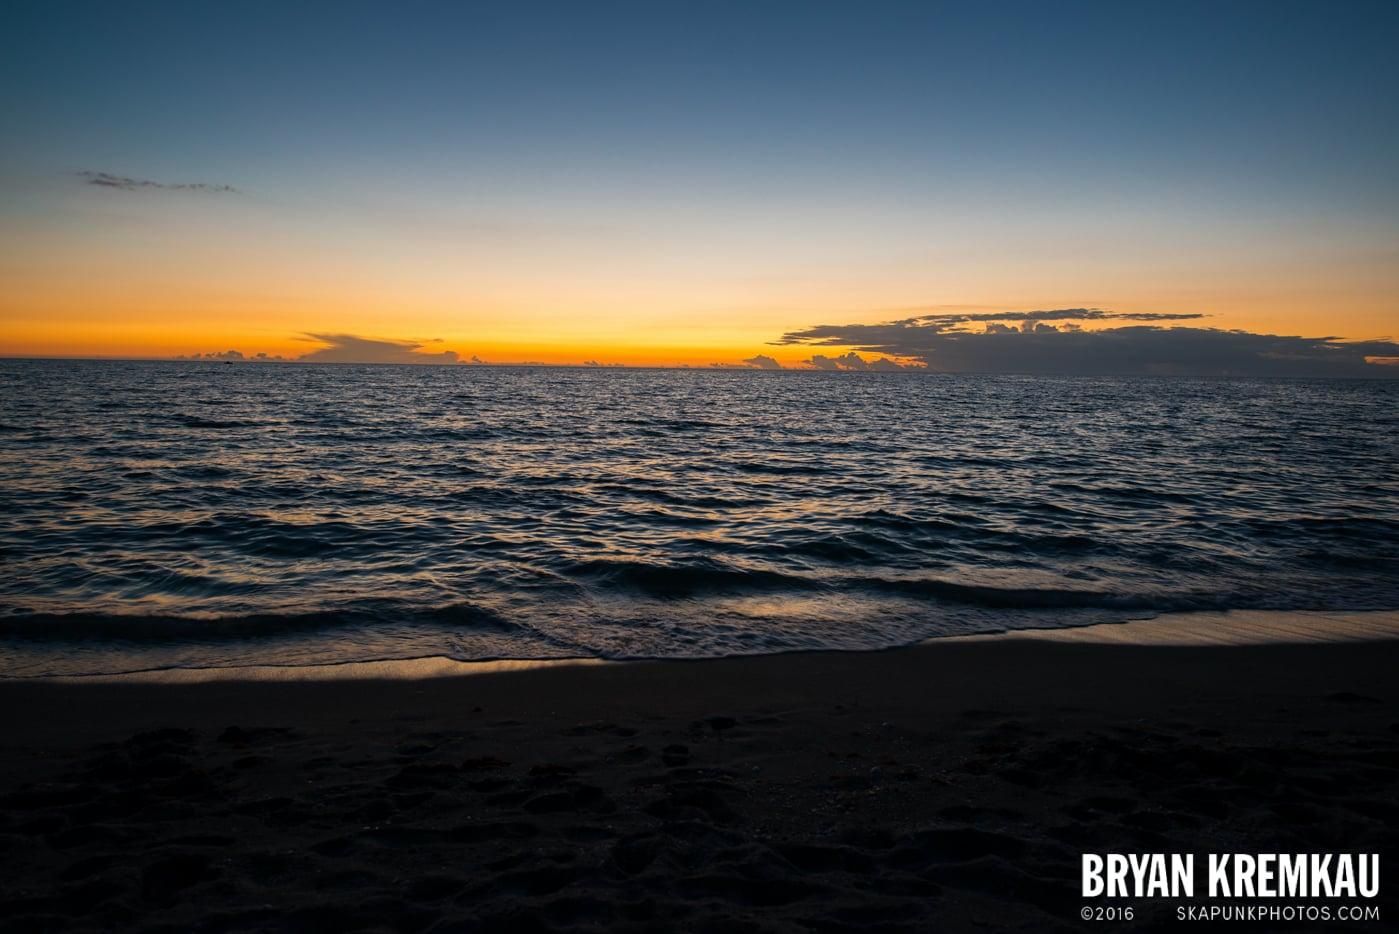 Sunsets, Astrophotography & Birds @ Venice, Florida - 10.25.14 - 11.5.14 (107)